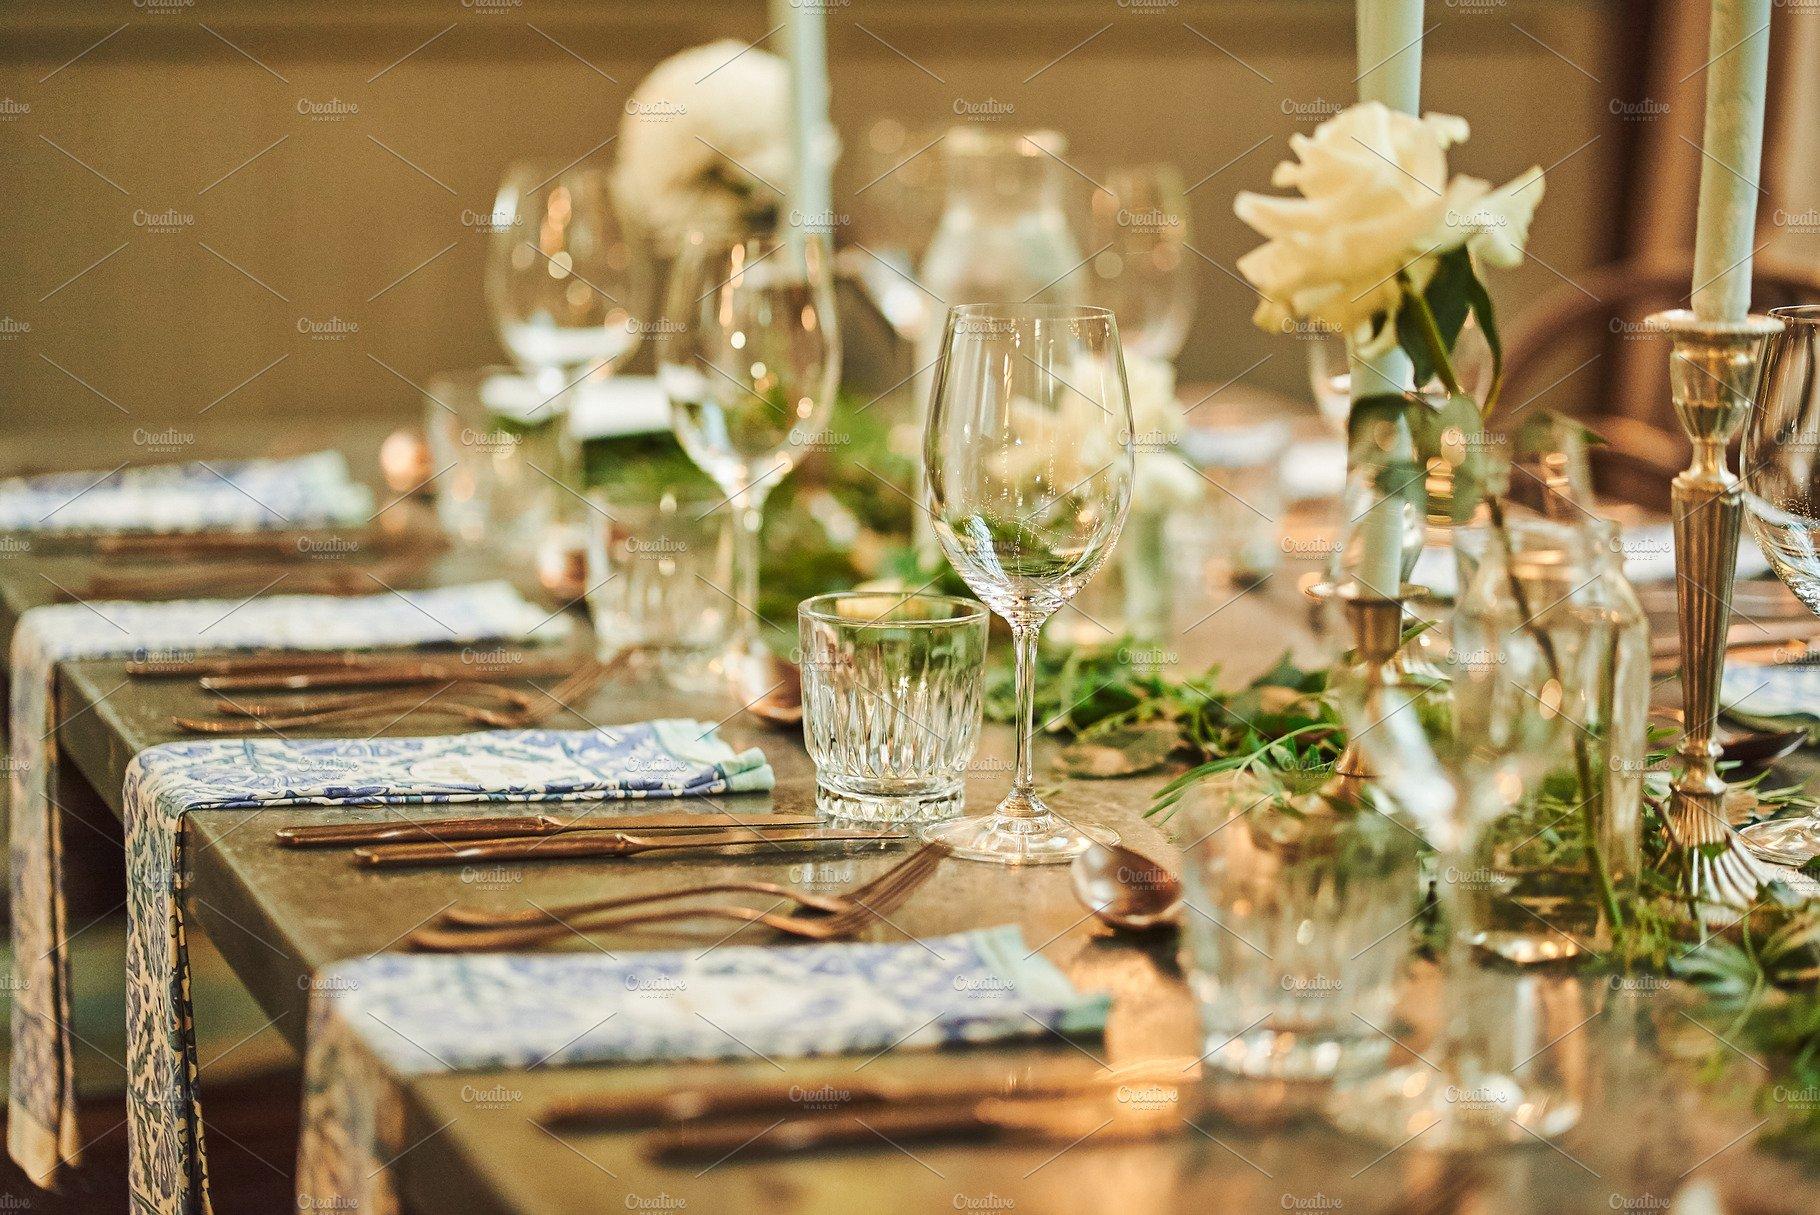 Vintage Wedding Table Setting | High-Quality Holiday Stock Photos ~  Creative Market